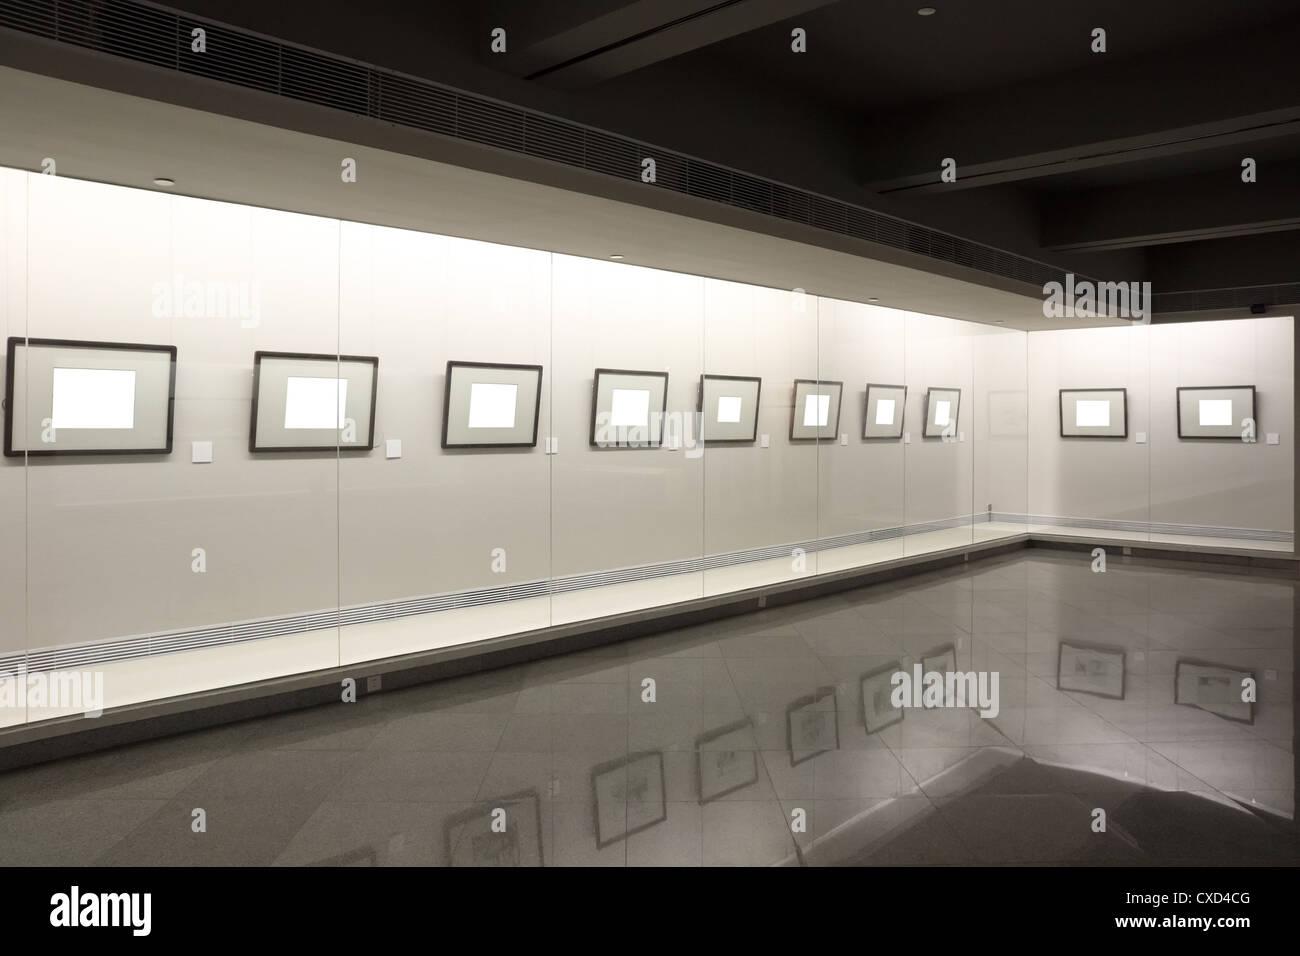 empty frames in showcase - Stock Image